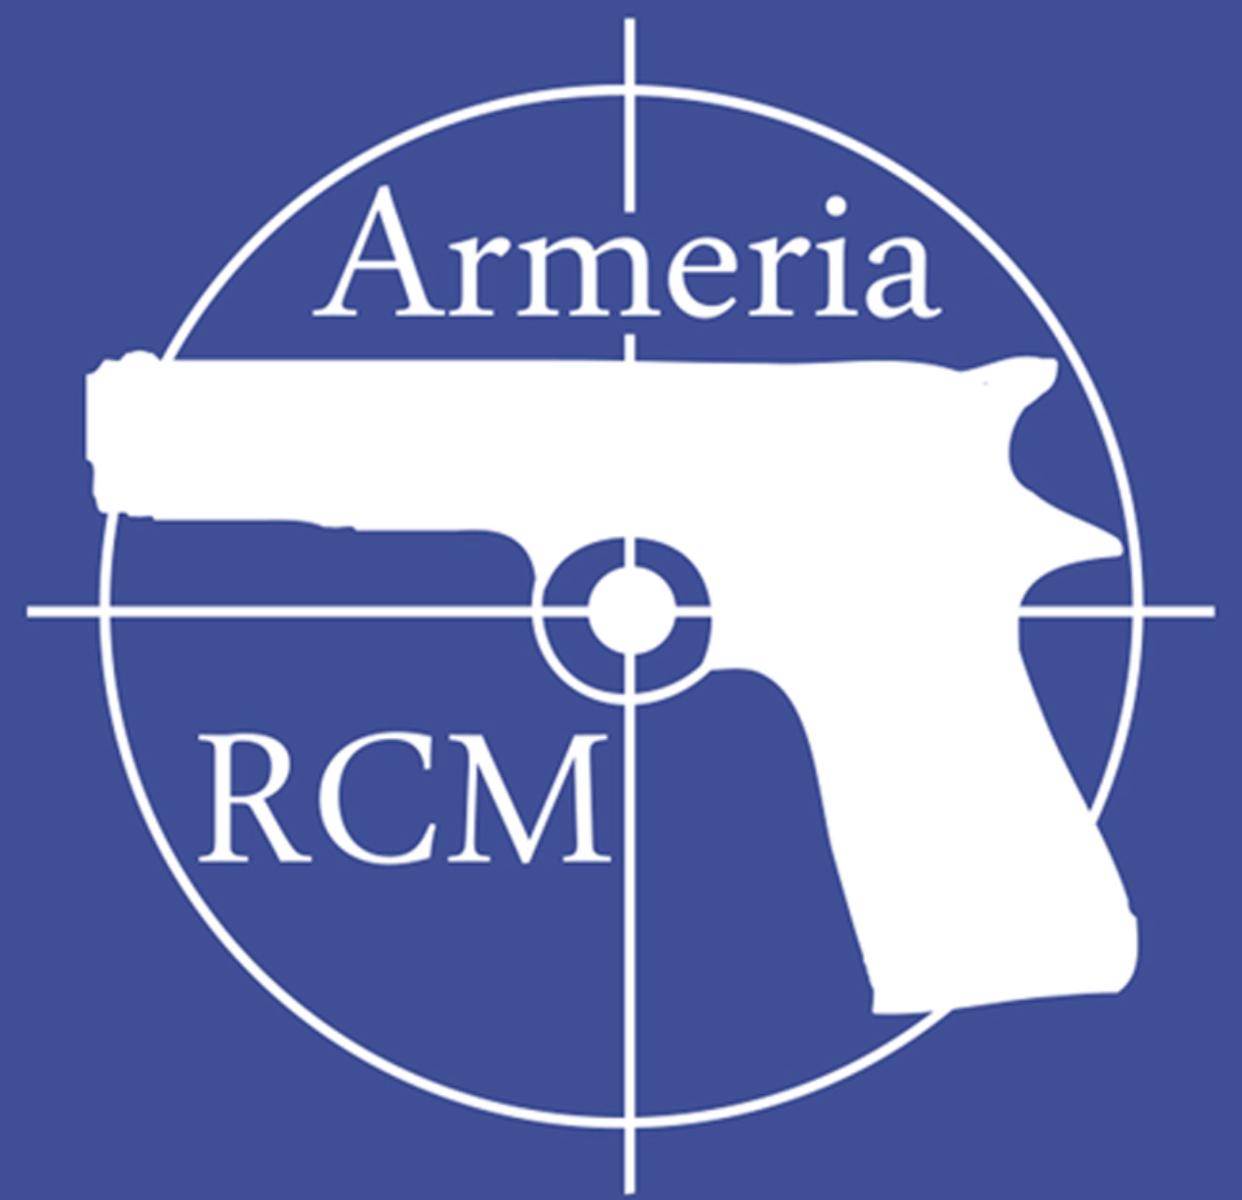 Armeria RCM